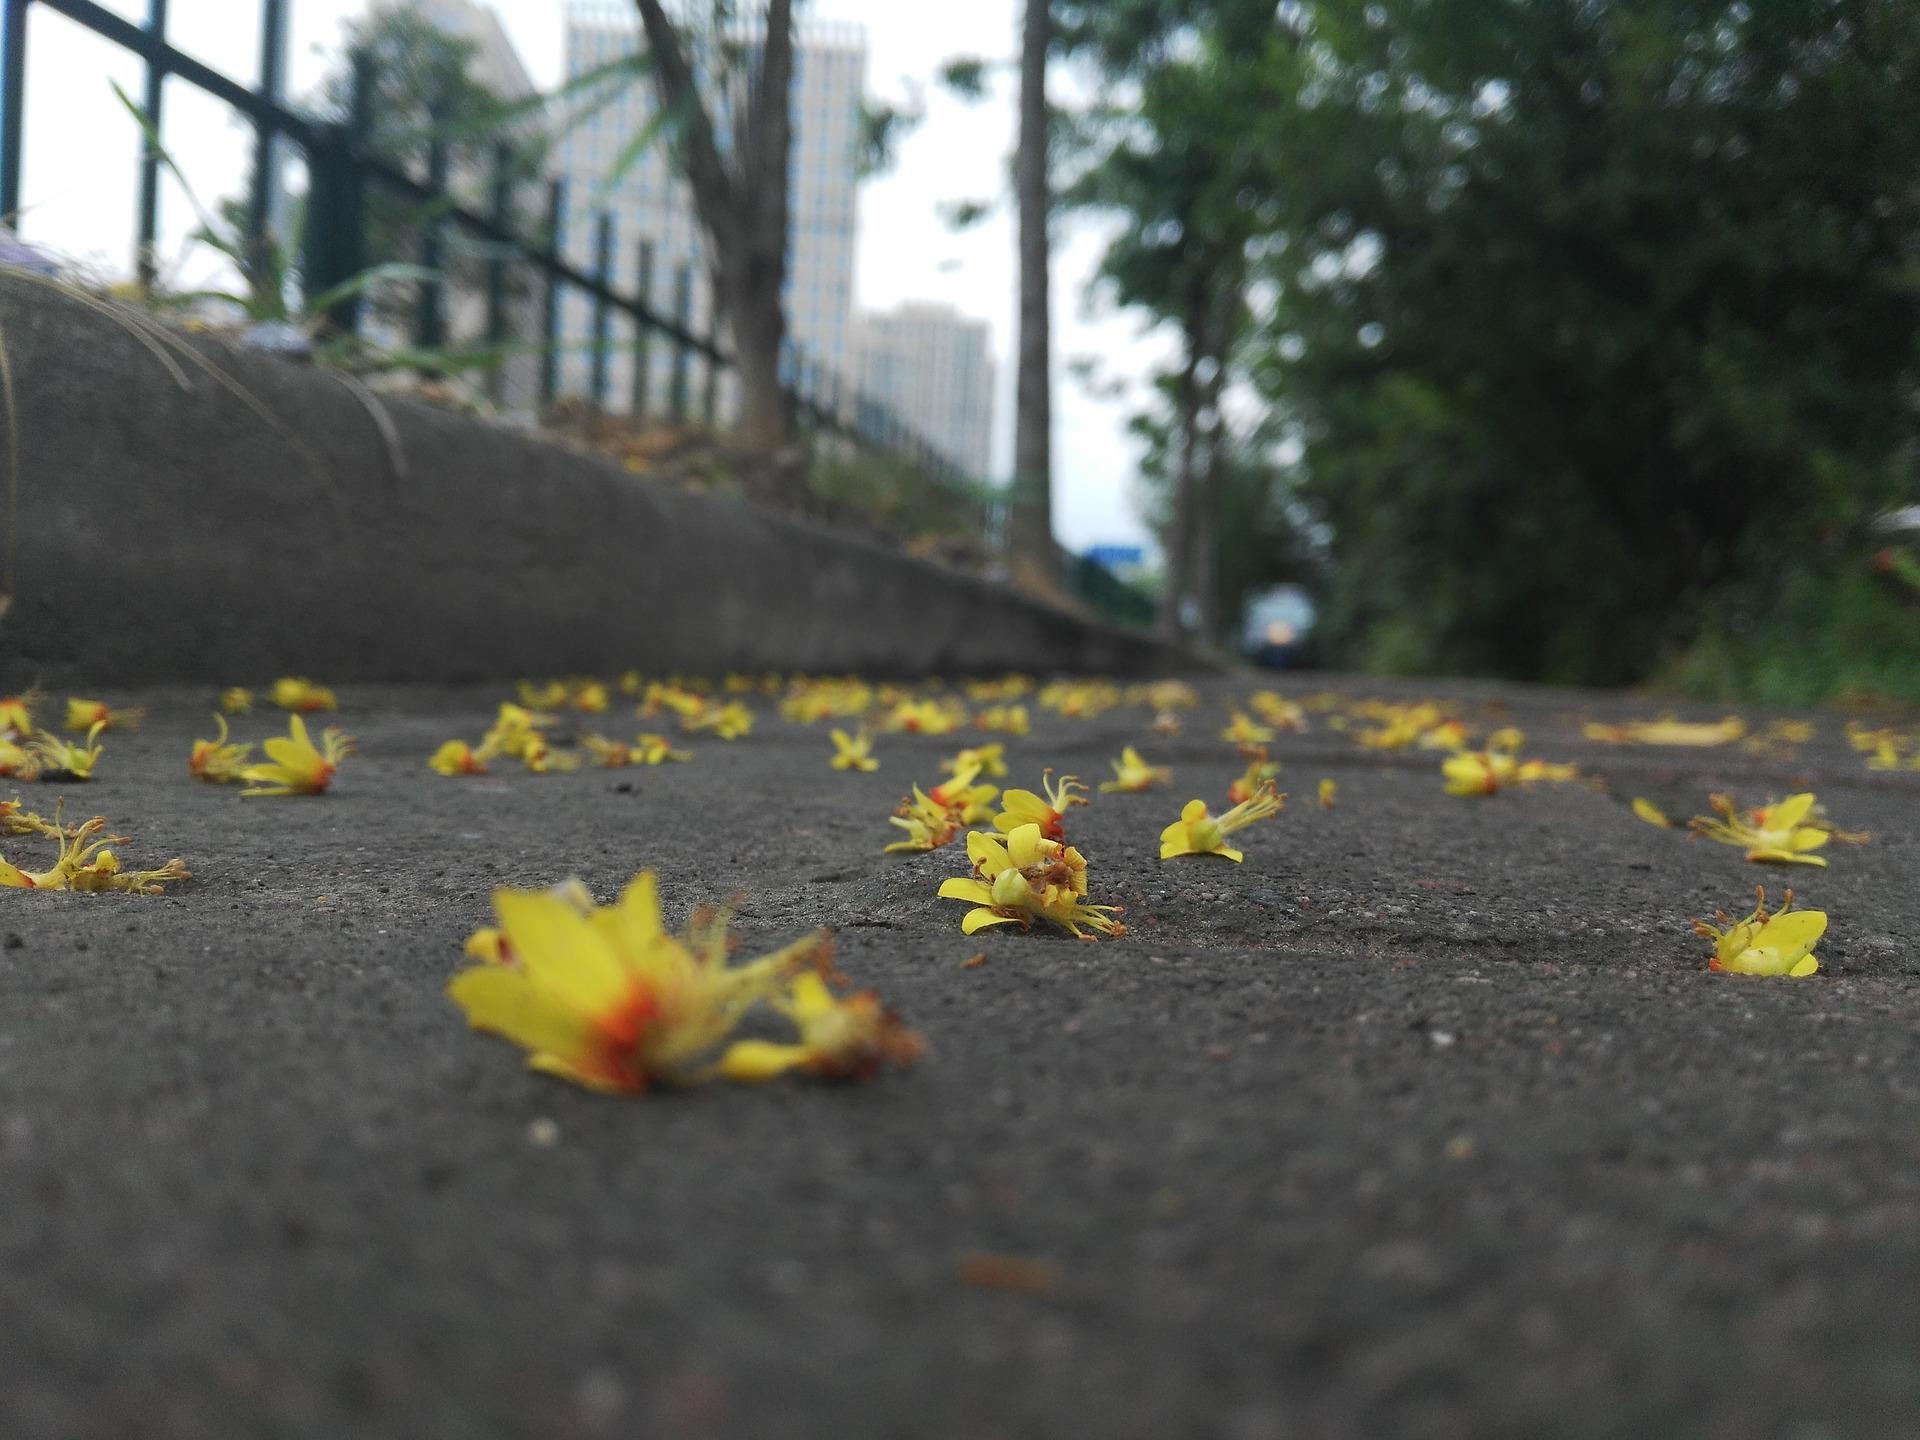 Public Domain. [Photo description: fallen flowers litter the ground of an empty, tree-lined street.]